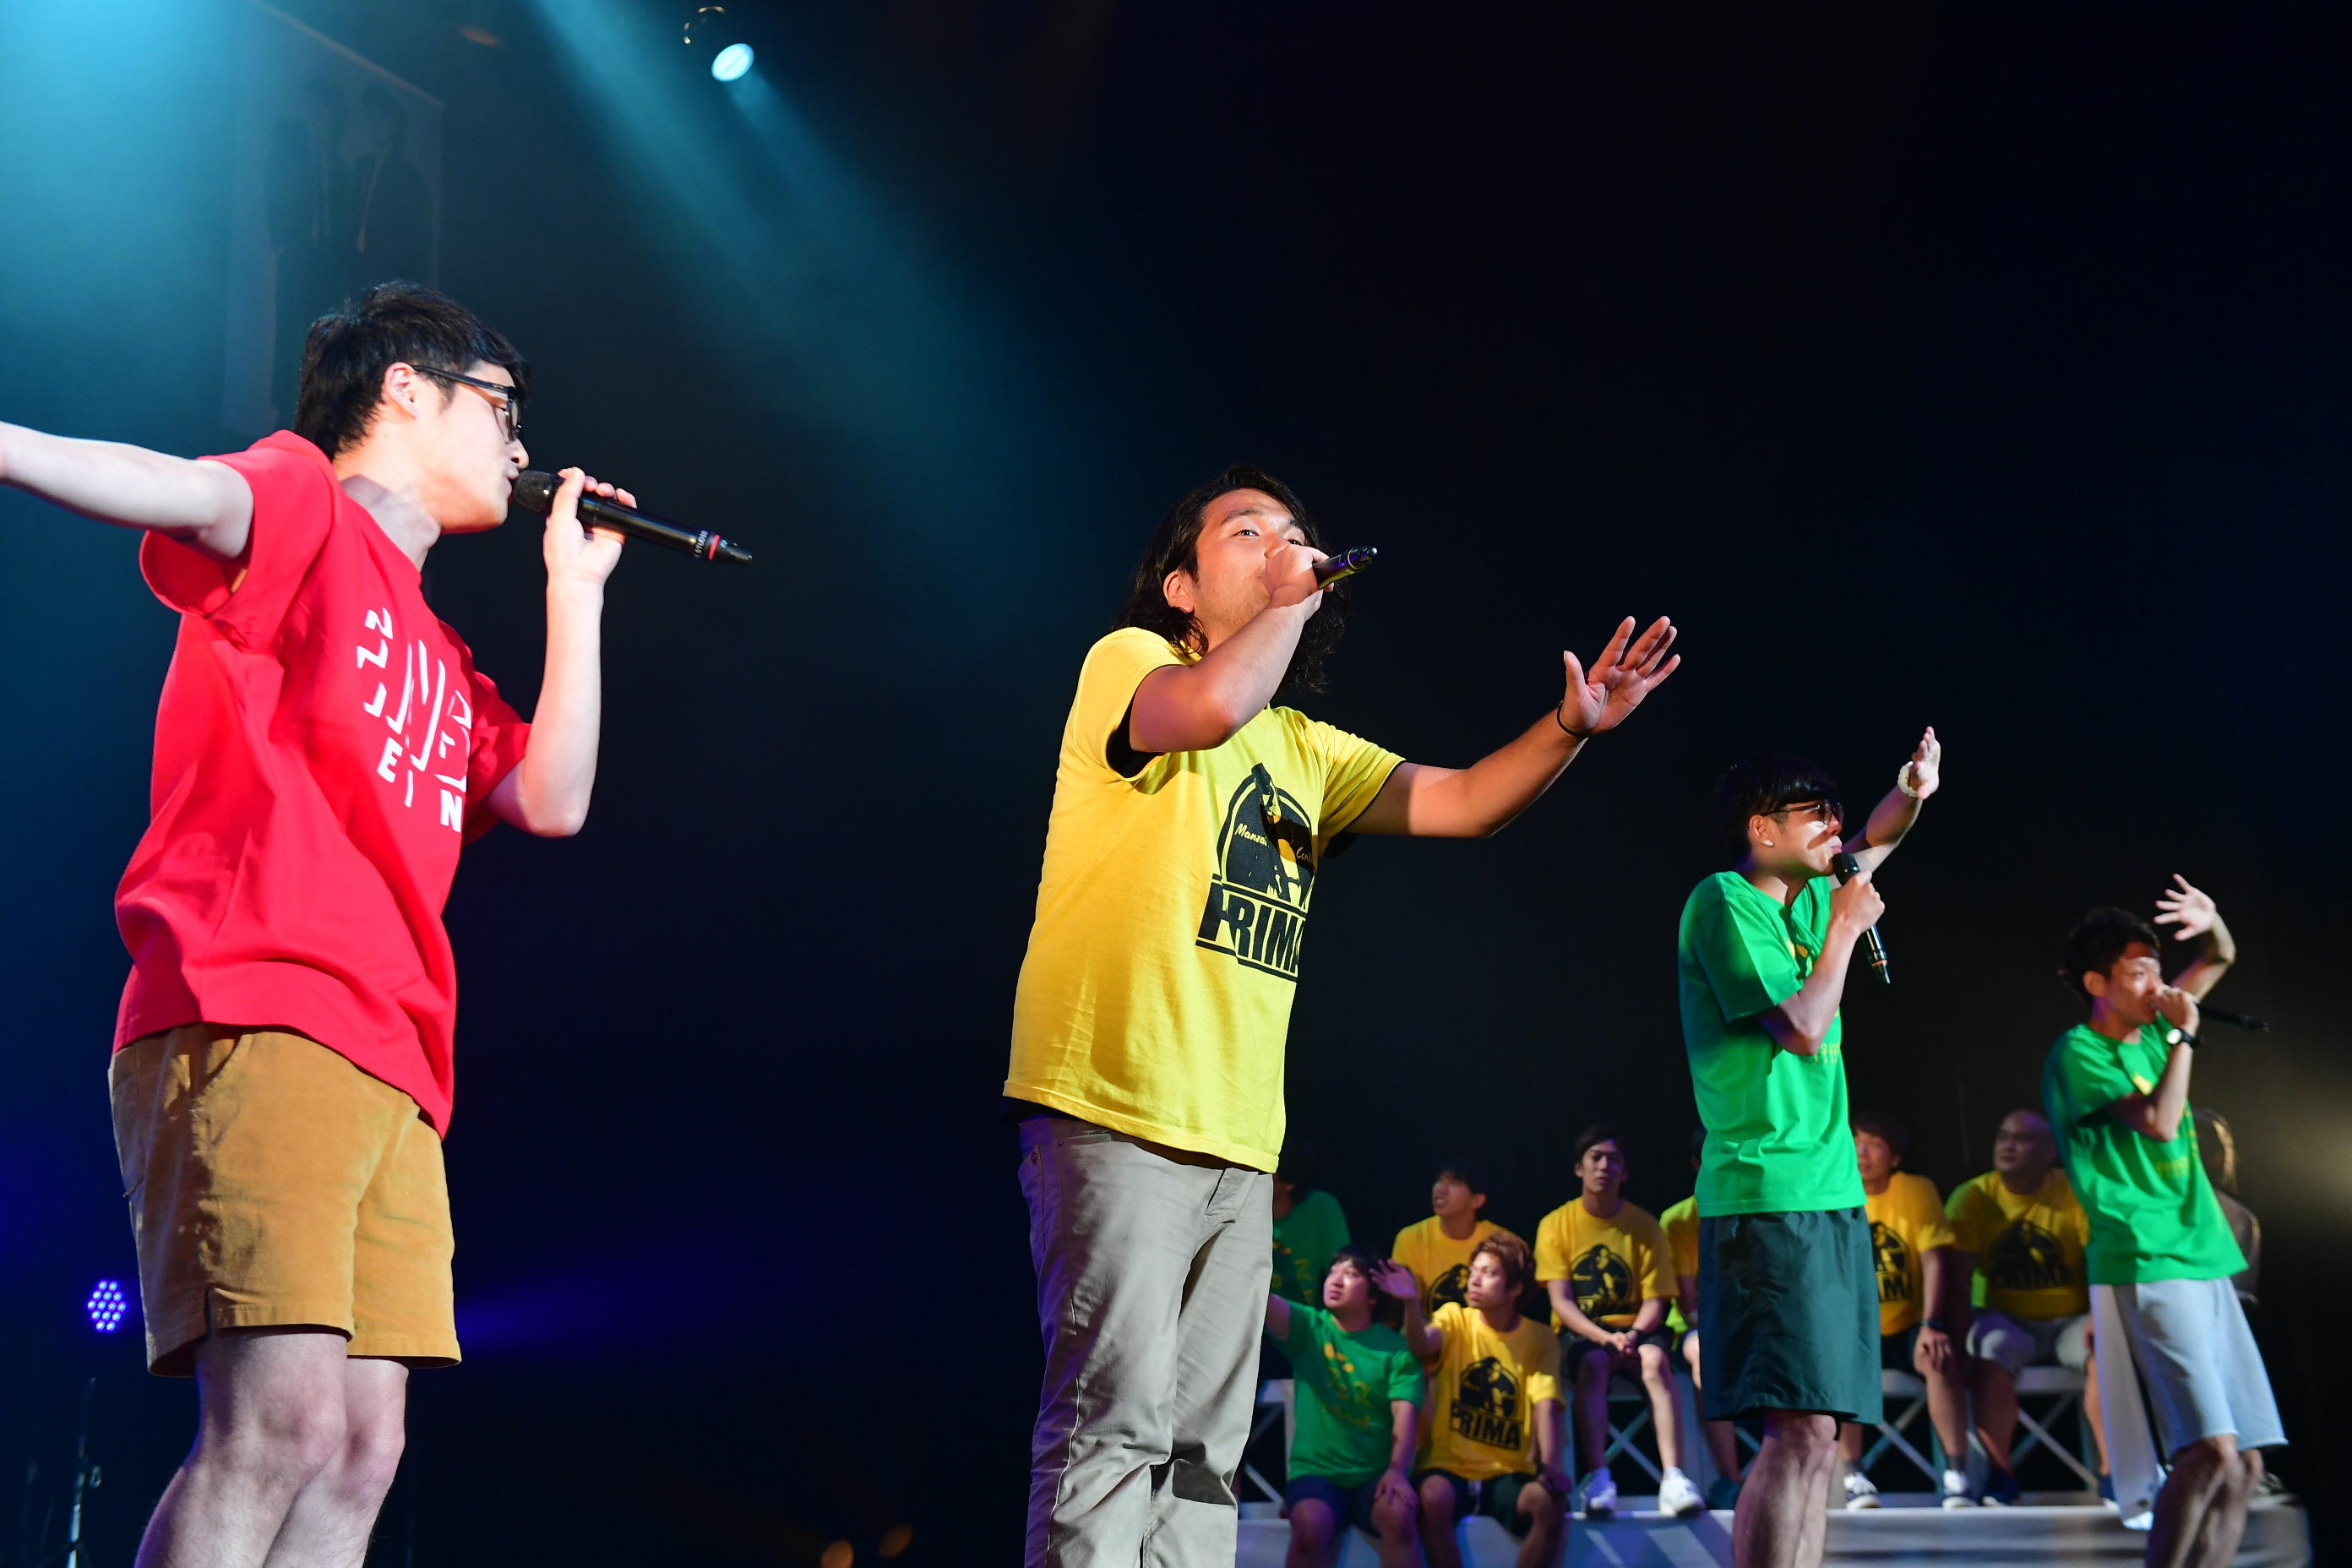 http://news.yoshimoto.co.jp/20180803011806-a01cf298f1e4c2cea0a3cc502444cf437c65e007.jpg